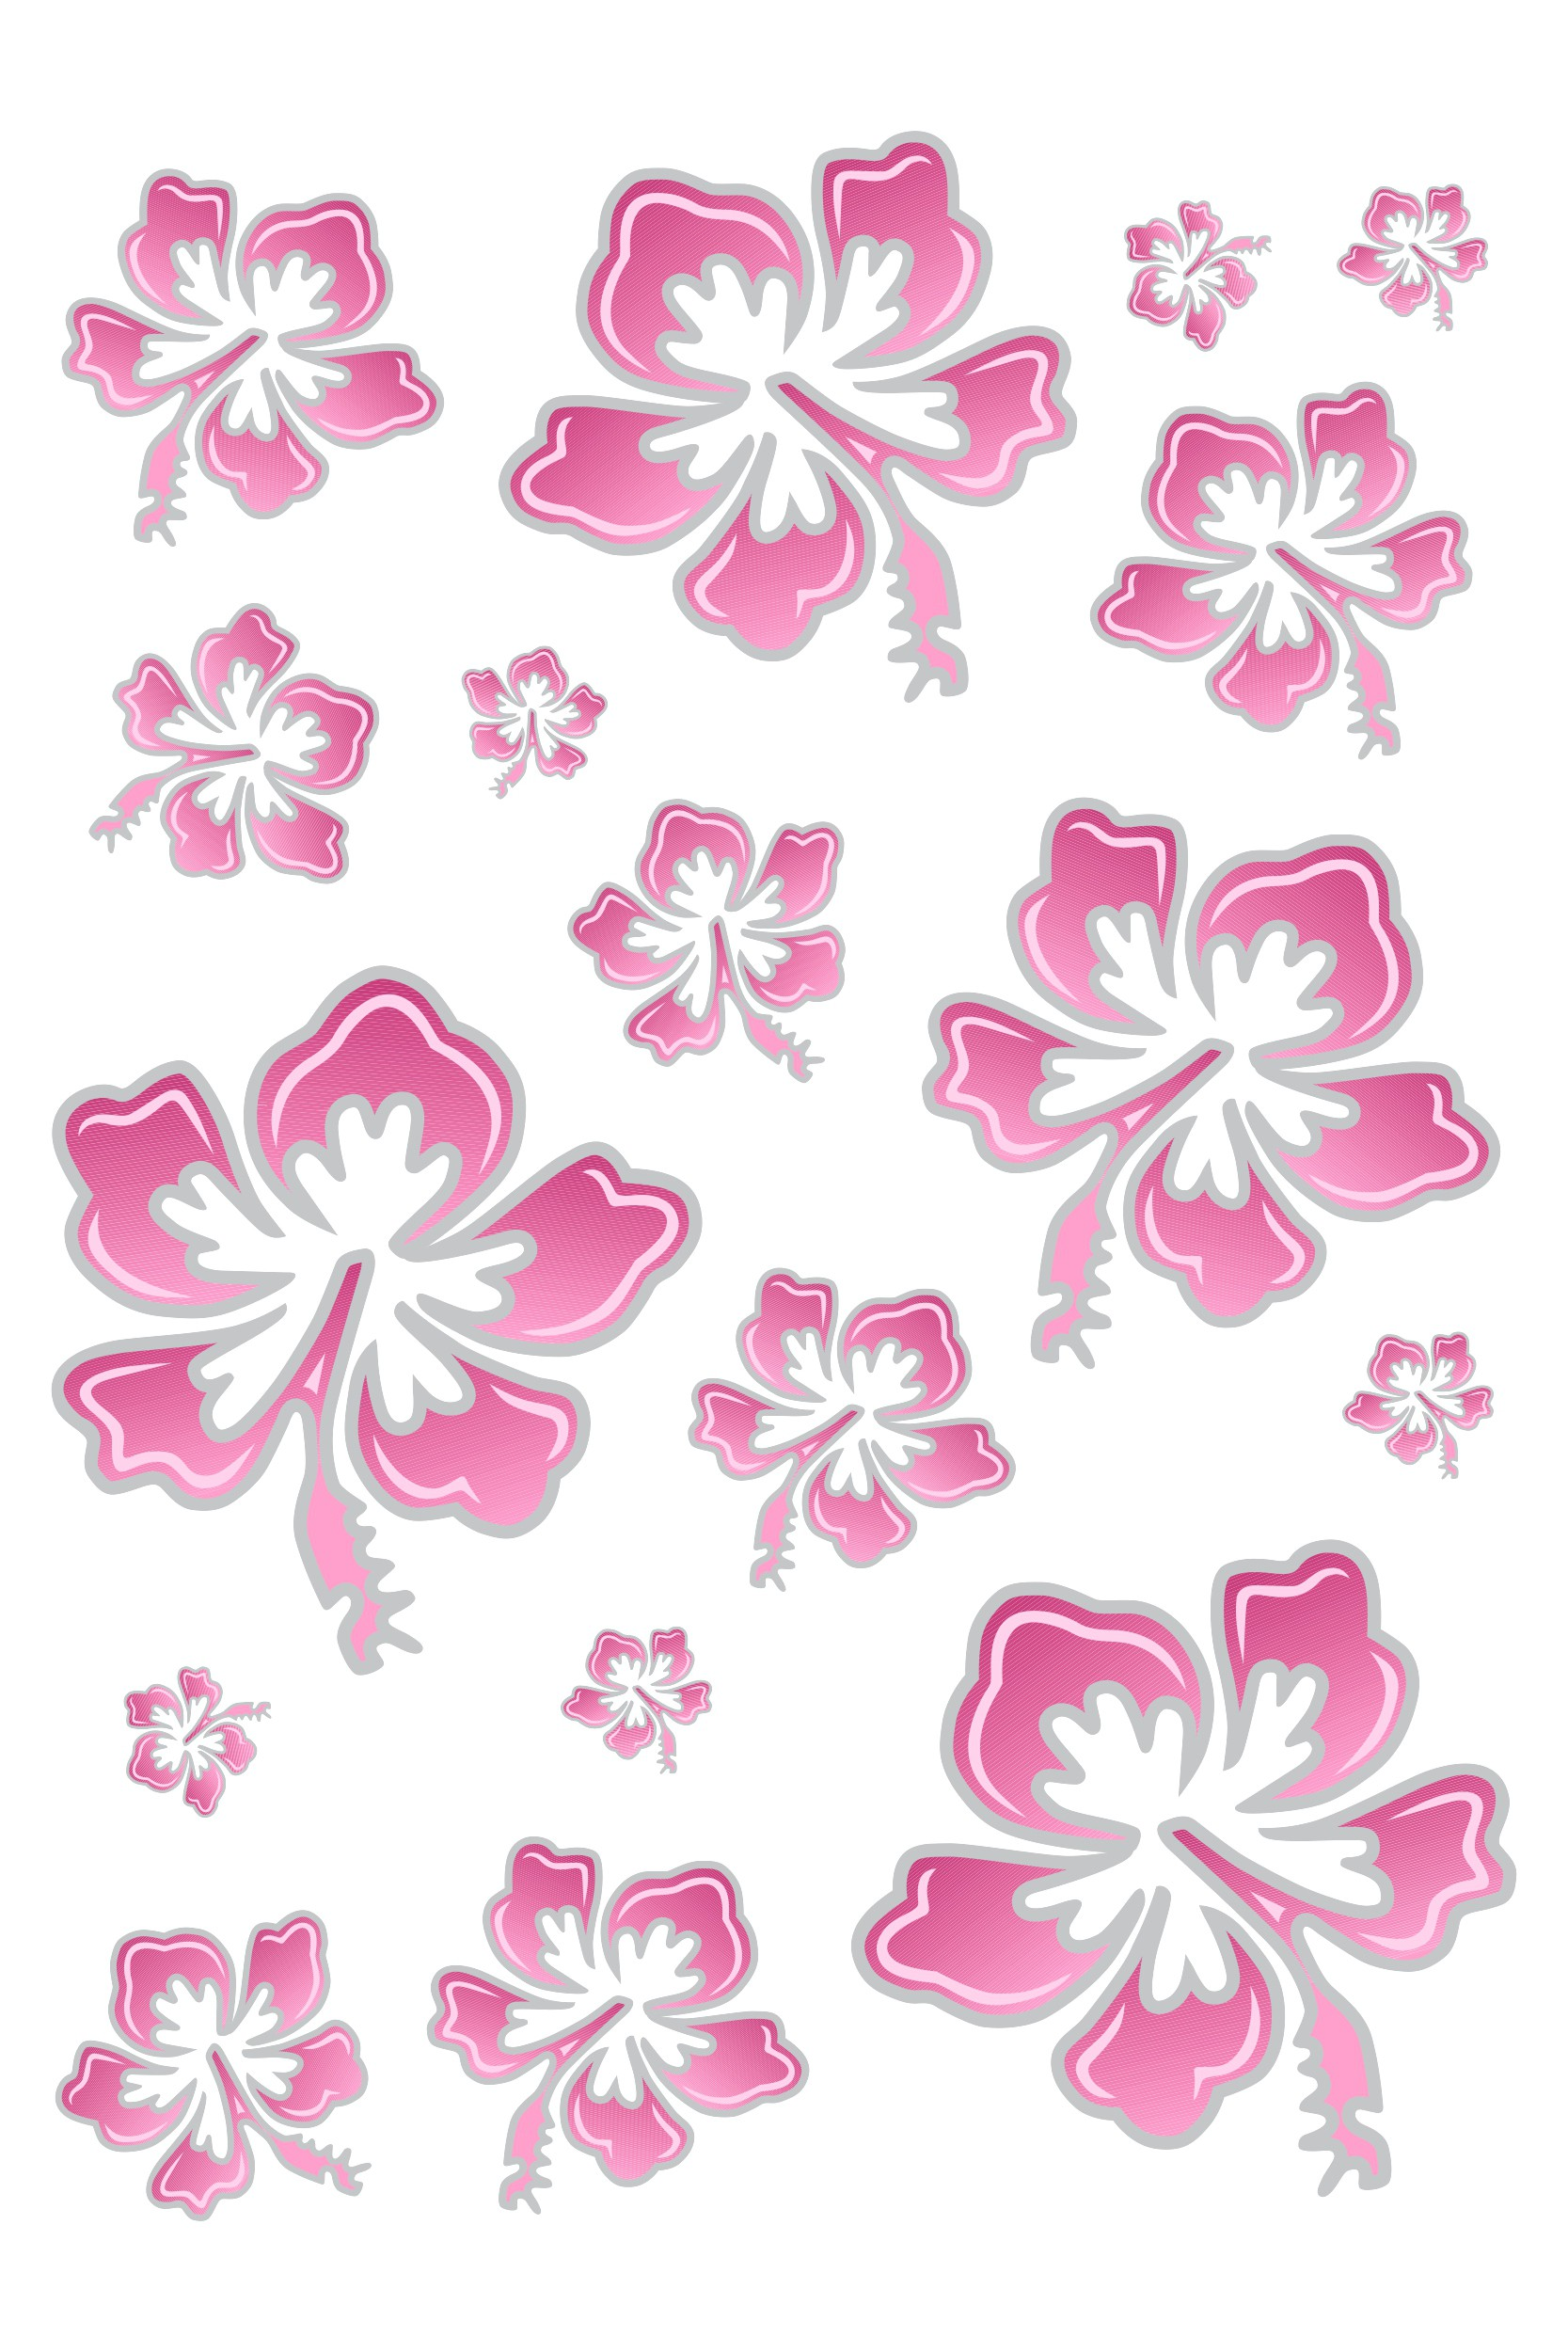 Sticker hibiscus flower set 300 x 200 mm pinksilver car deco sticker hibiscus flower set 300 x 200 mm pinksilver izmirmasajfo